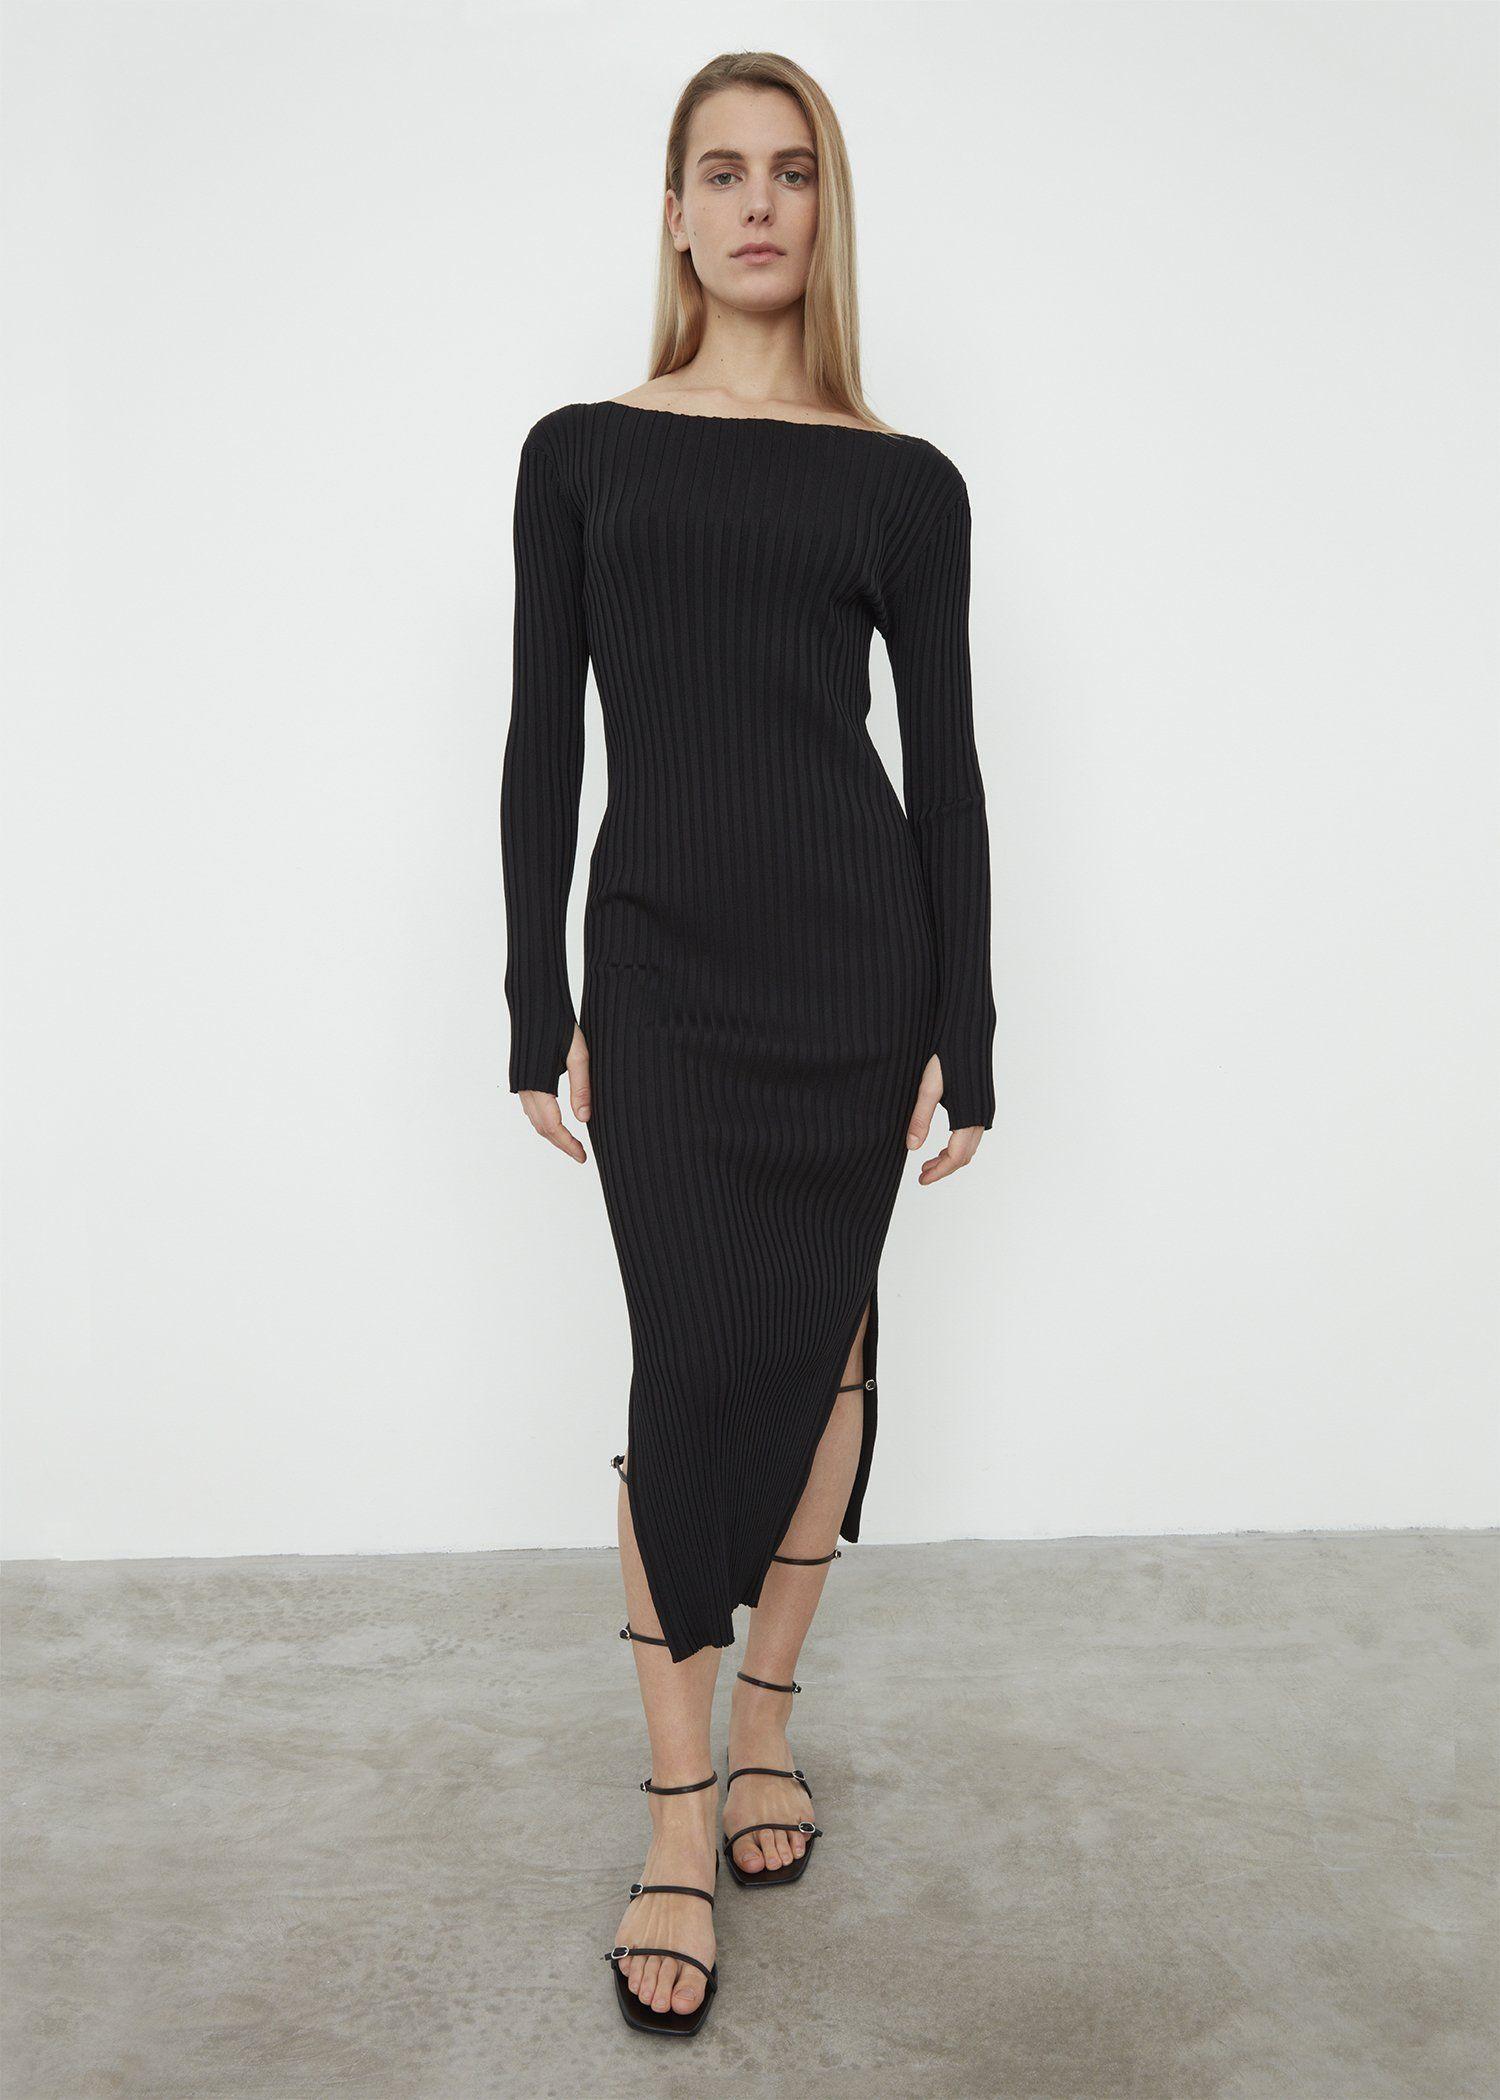 Dresses Skirts Dresses Dress Skirt Slim Fit Dresses [ 2100 x 1500 Pixel ]